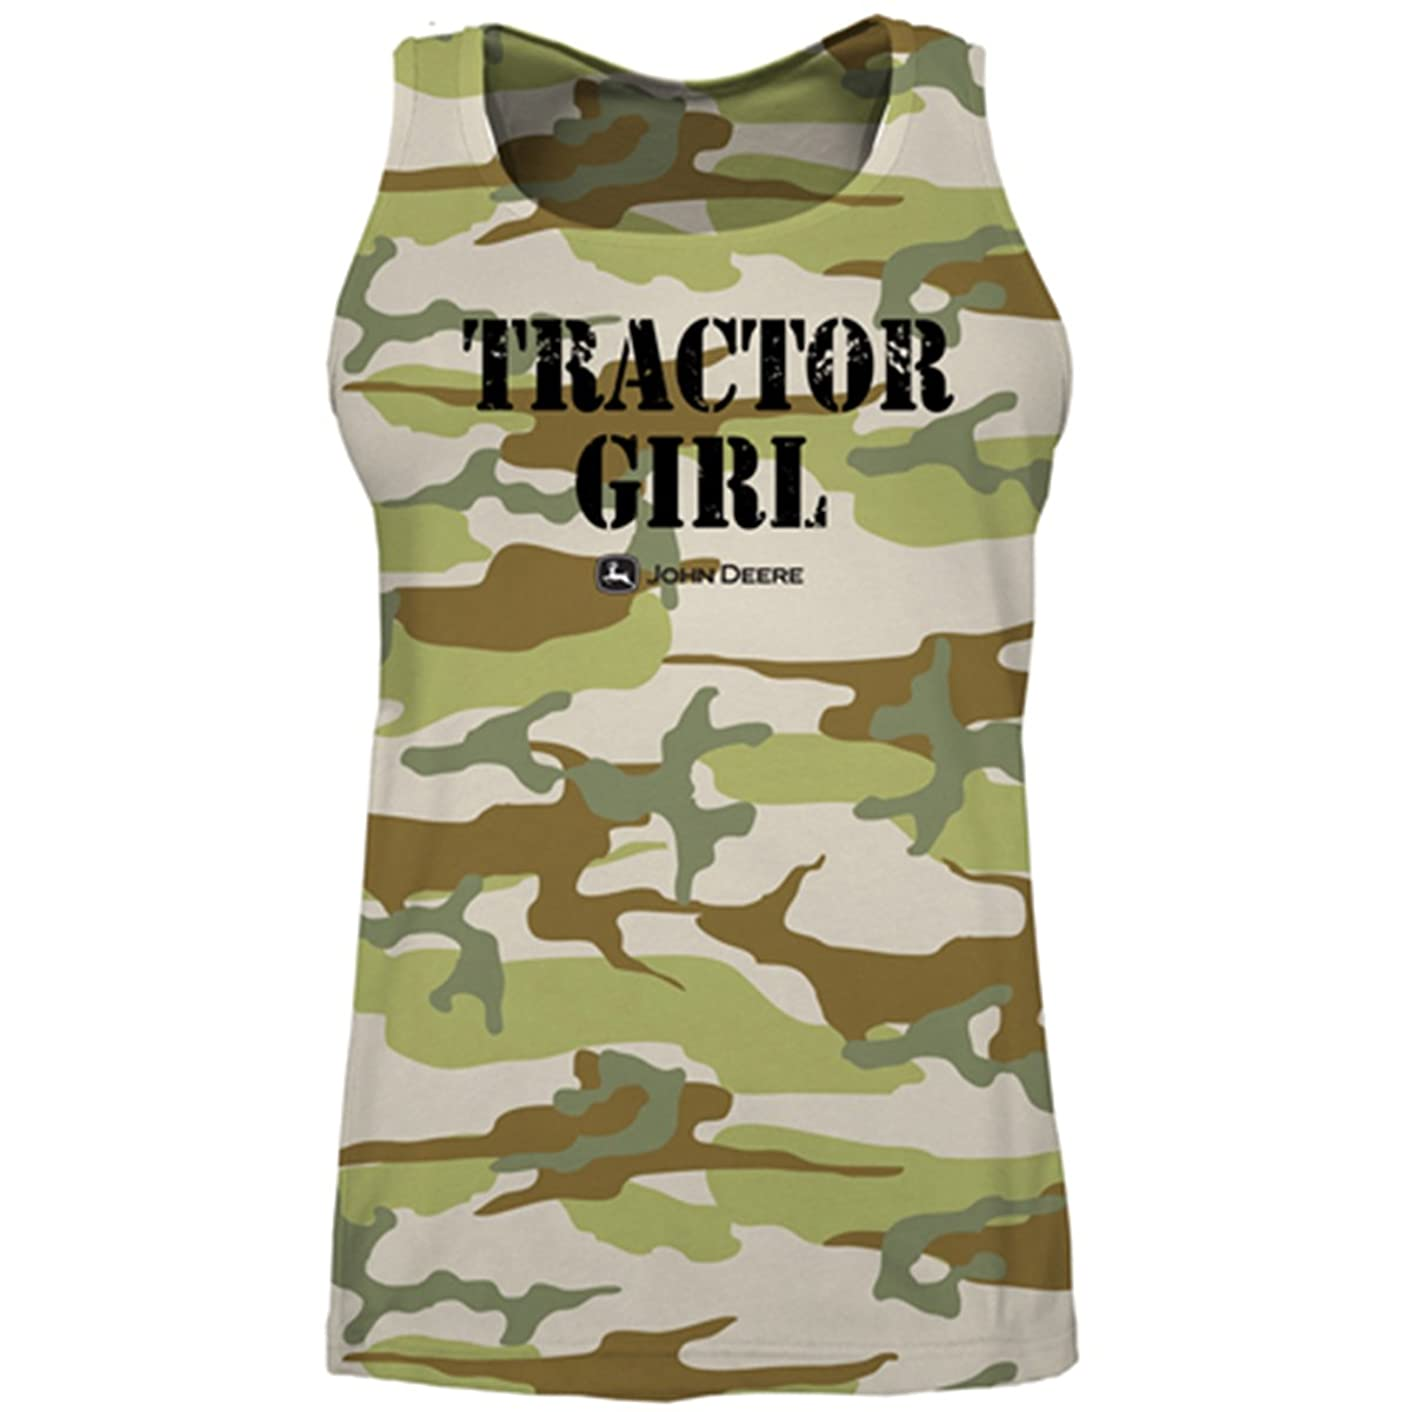 John Deere Camo Tractor Girl Women's Tank Top Green